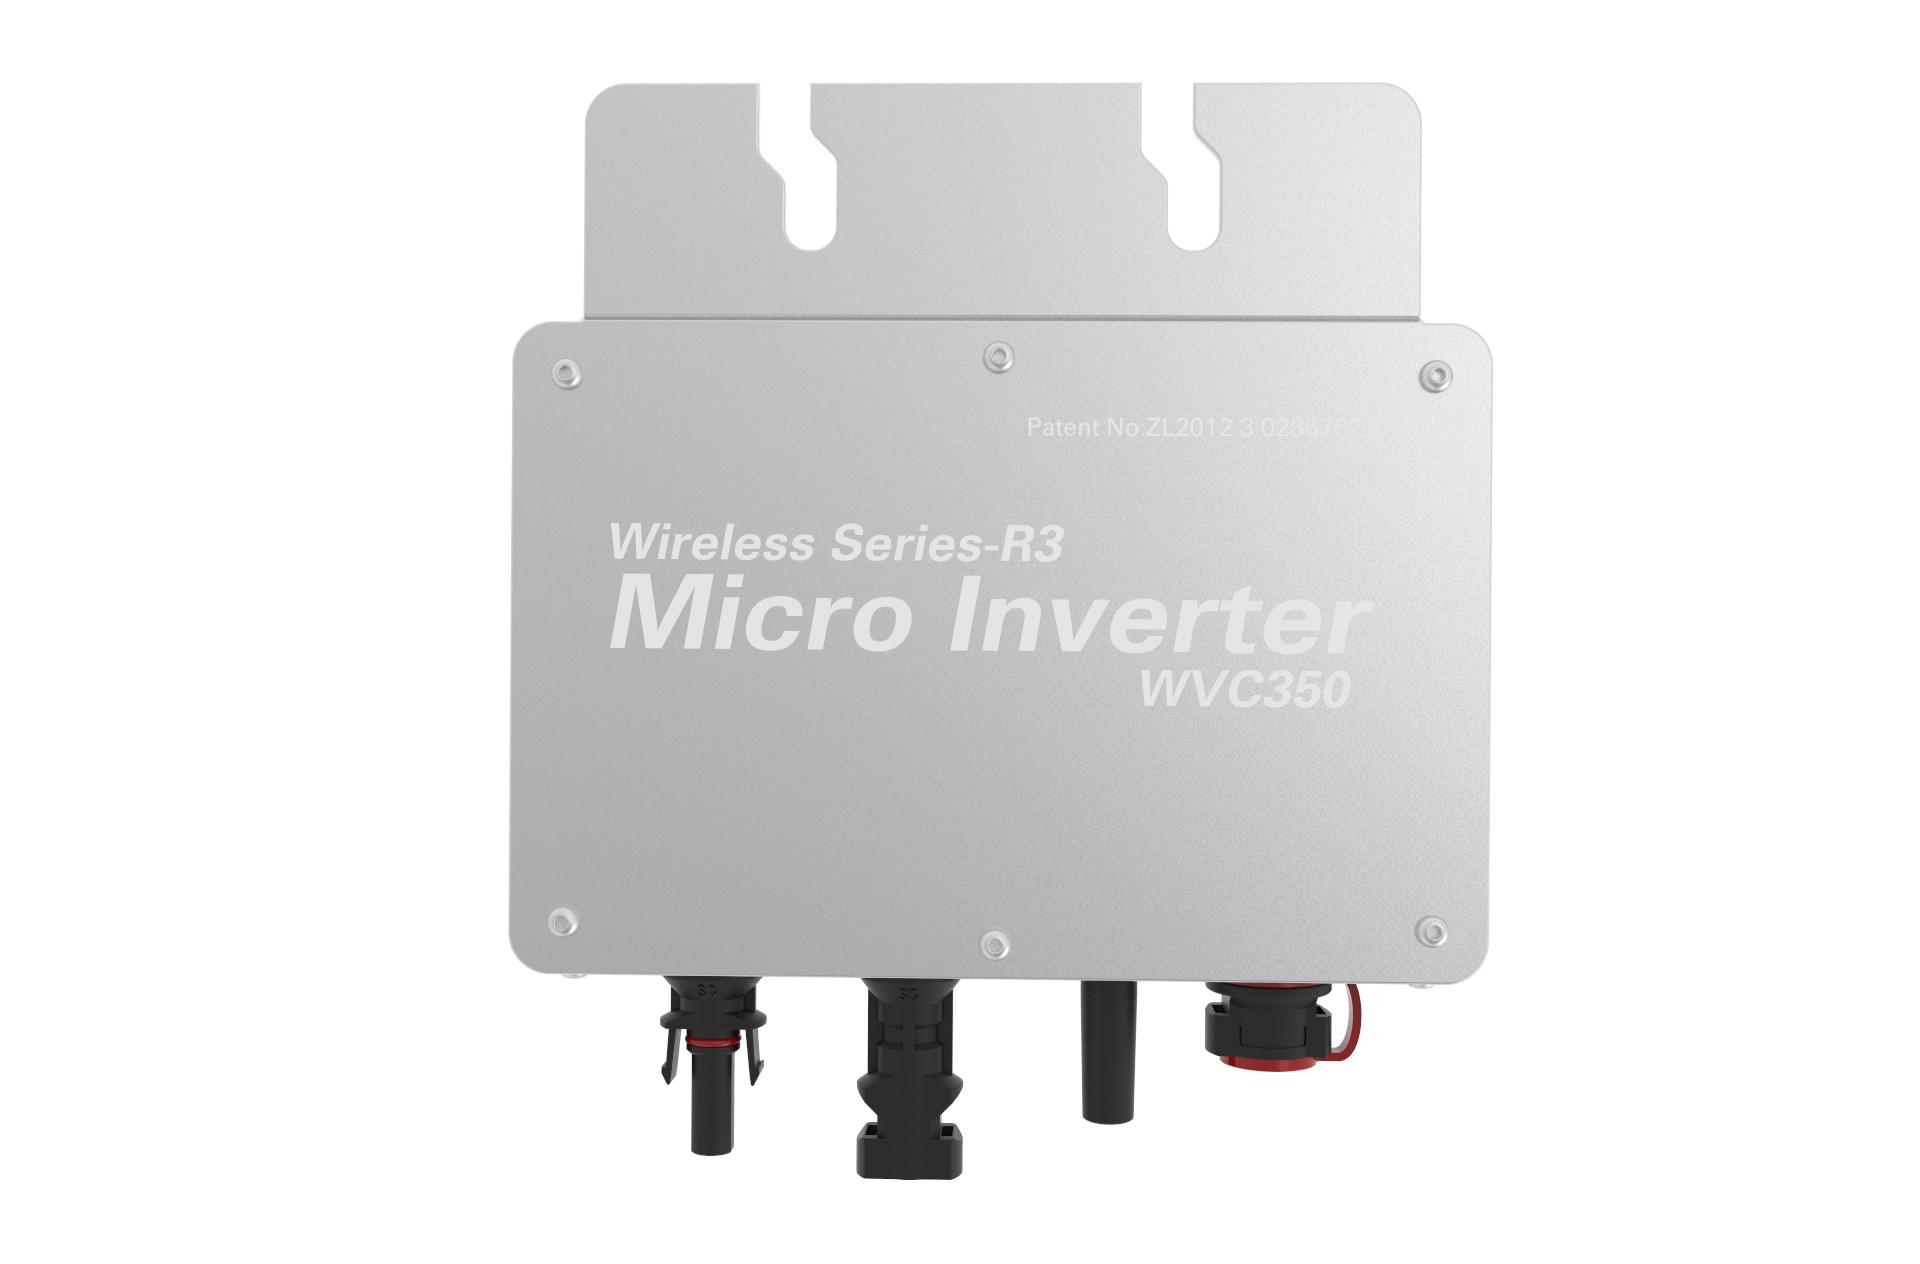 Mikroinwerter_ WVC350 (4)